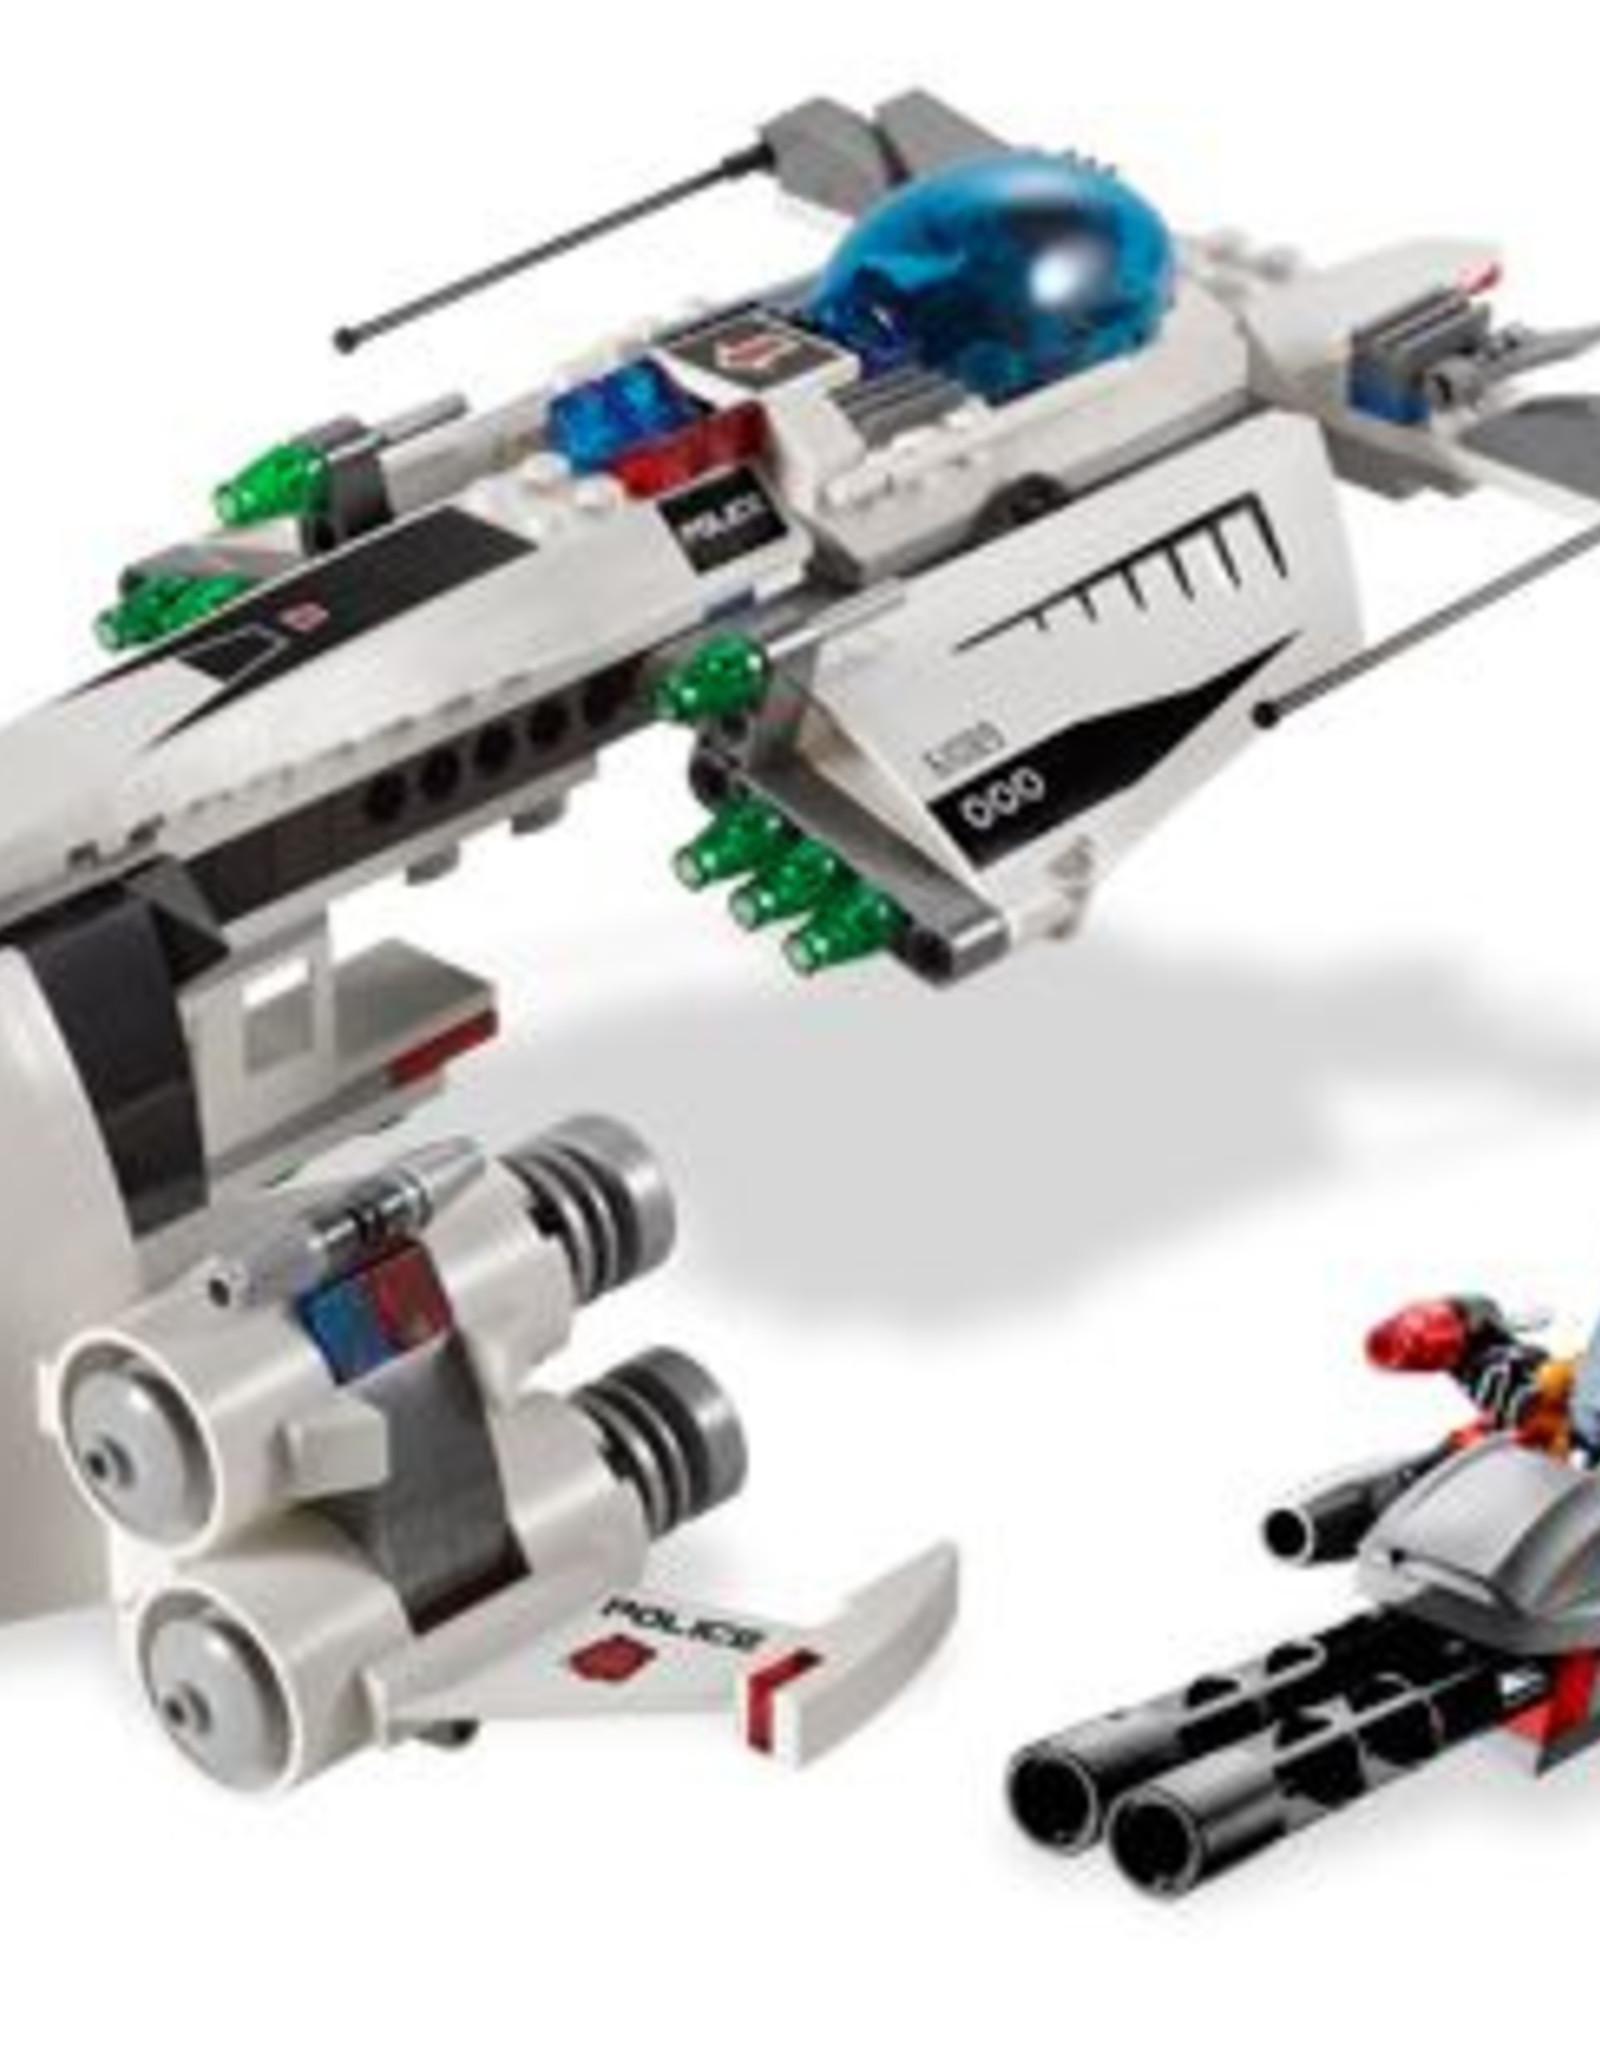 LEGO LEGO 5983 SP Undercover Cruiser SPACE POLICE